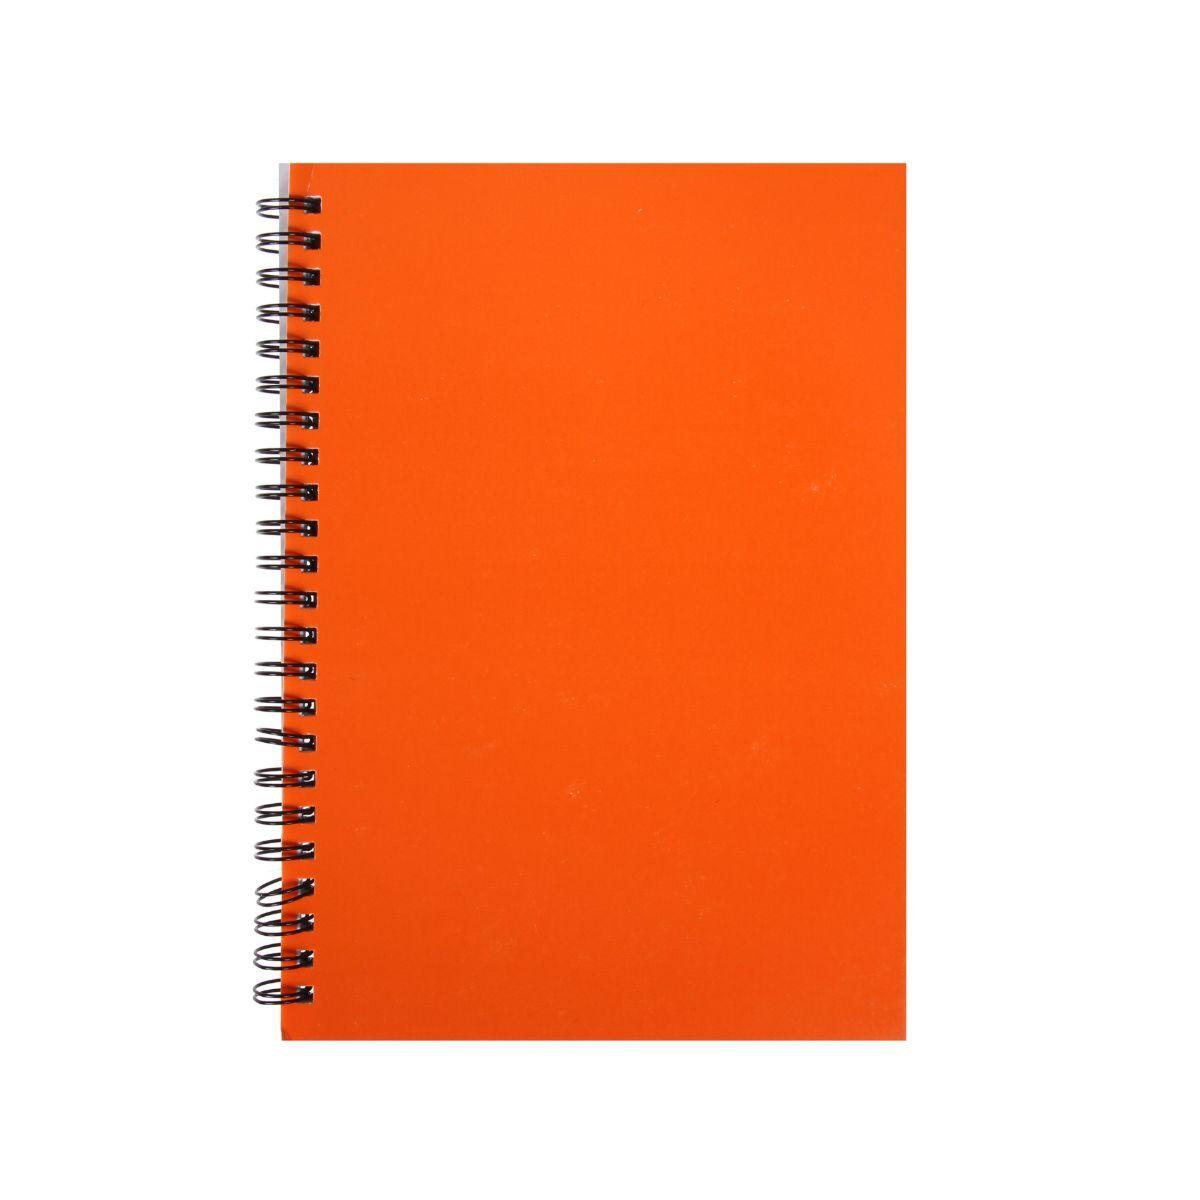 Ryman Essentials Notebooks A5 Ruled 80 Sheets Orange